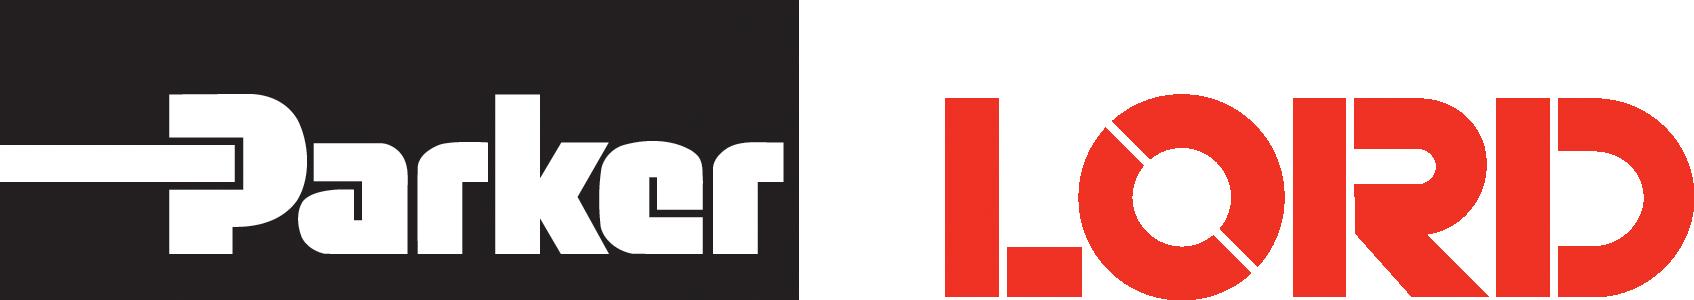 Parker-LORD-Logo-COLOR